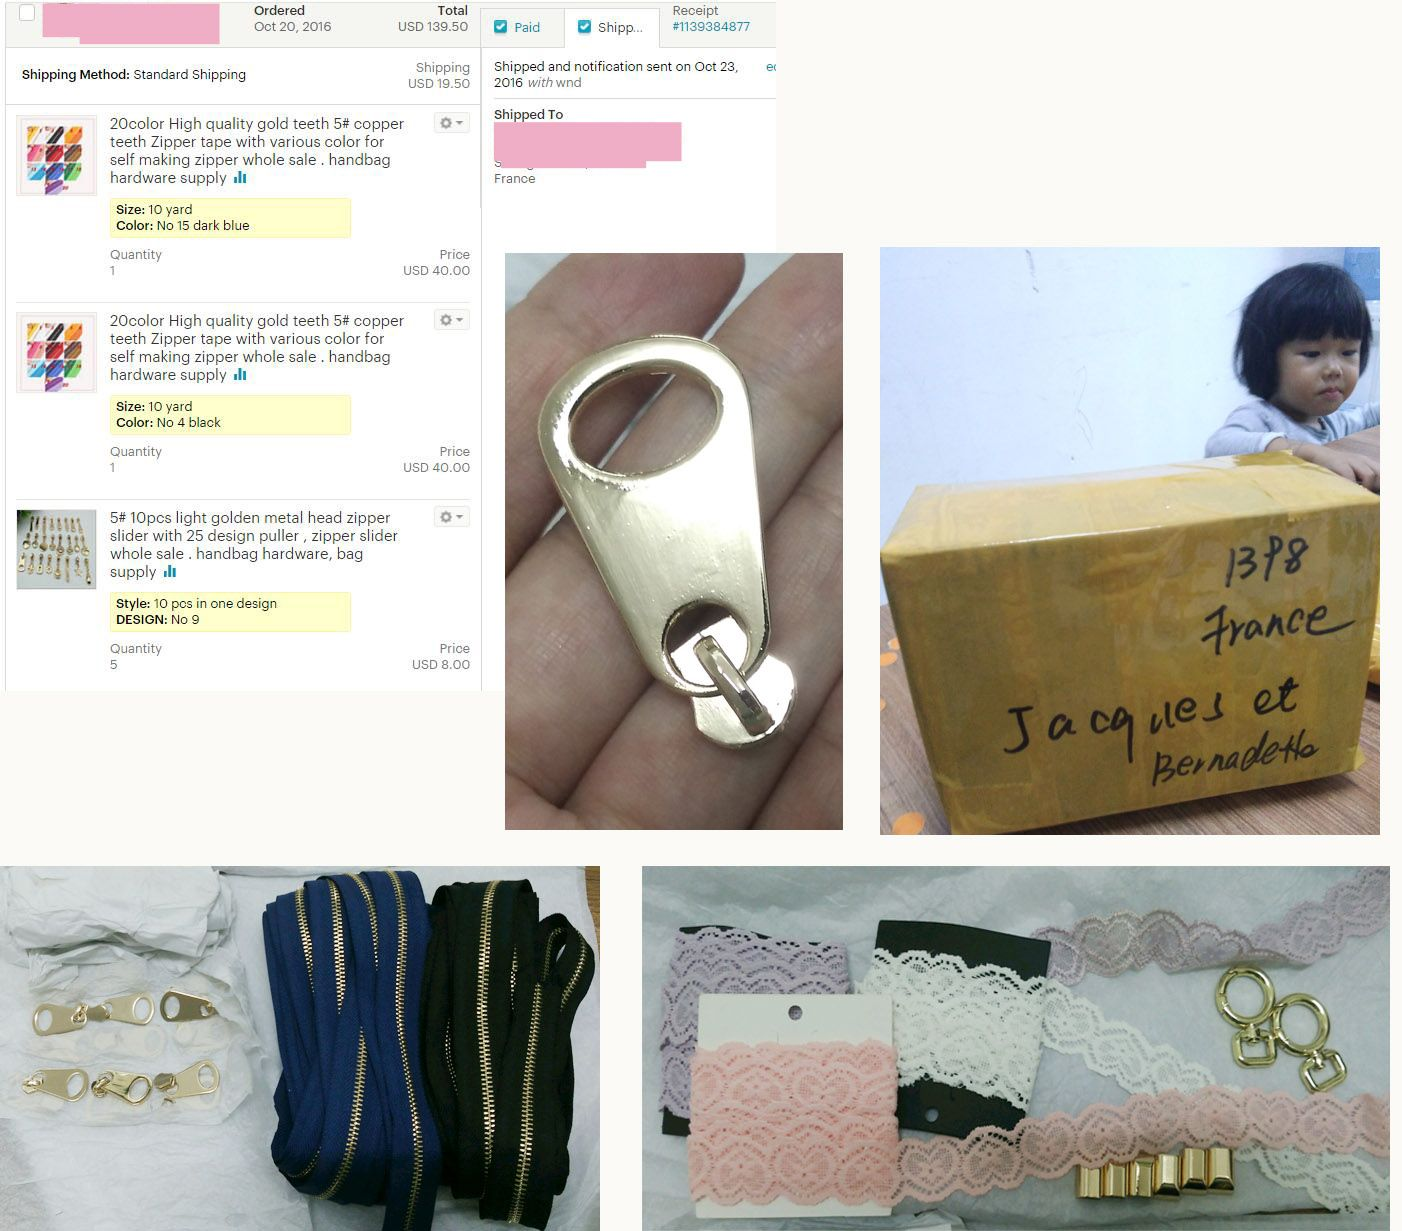 Light Golden Metal Head Zipper Slider With 25 Design Puller Whole Handbag Hardware Bag Supply High Quality Gold Teeth Copper